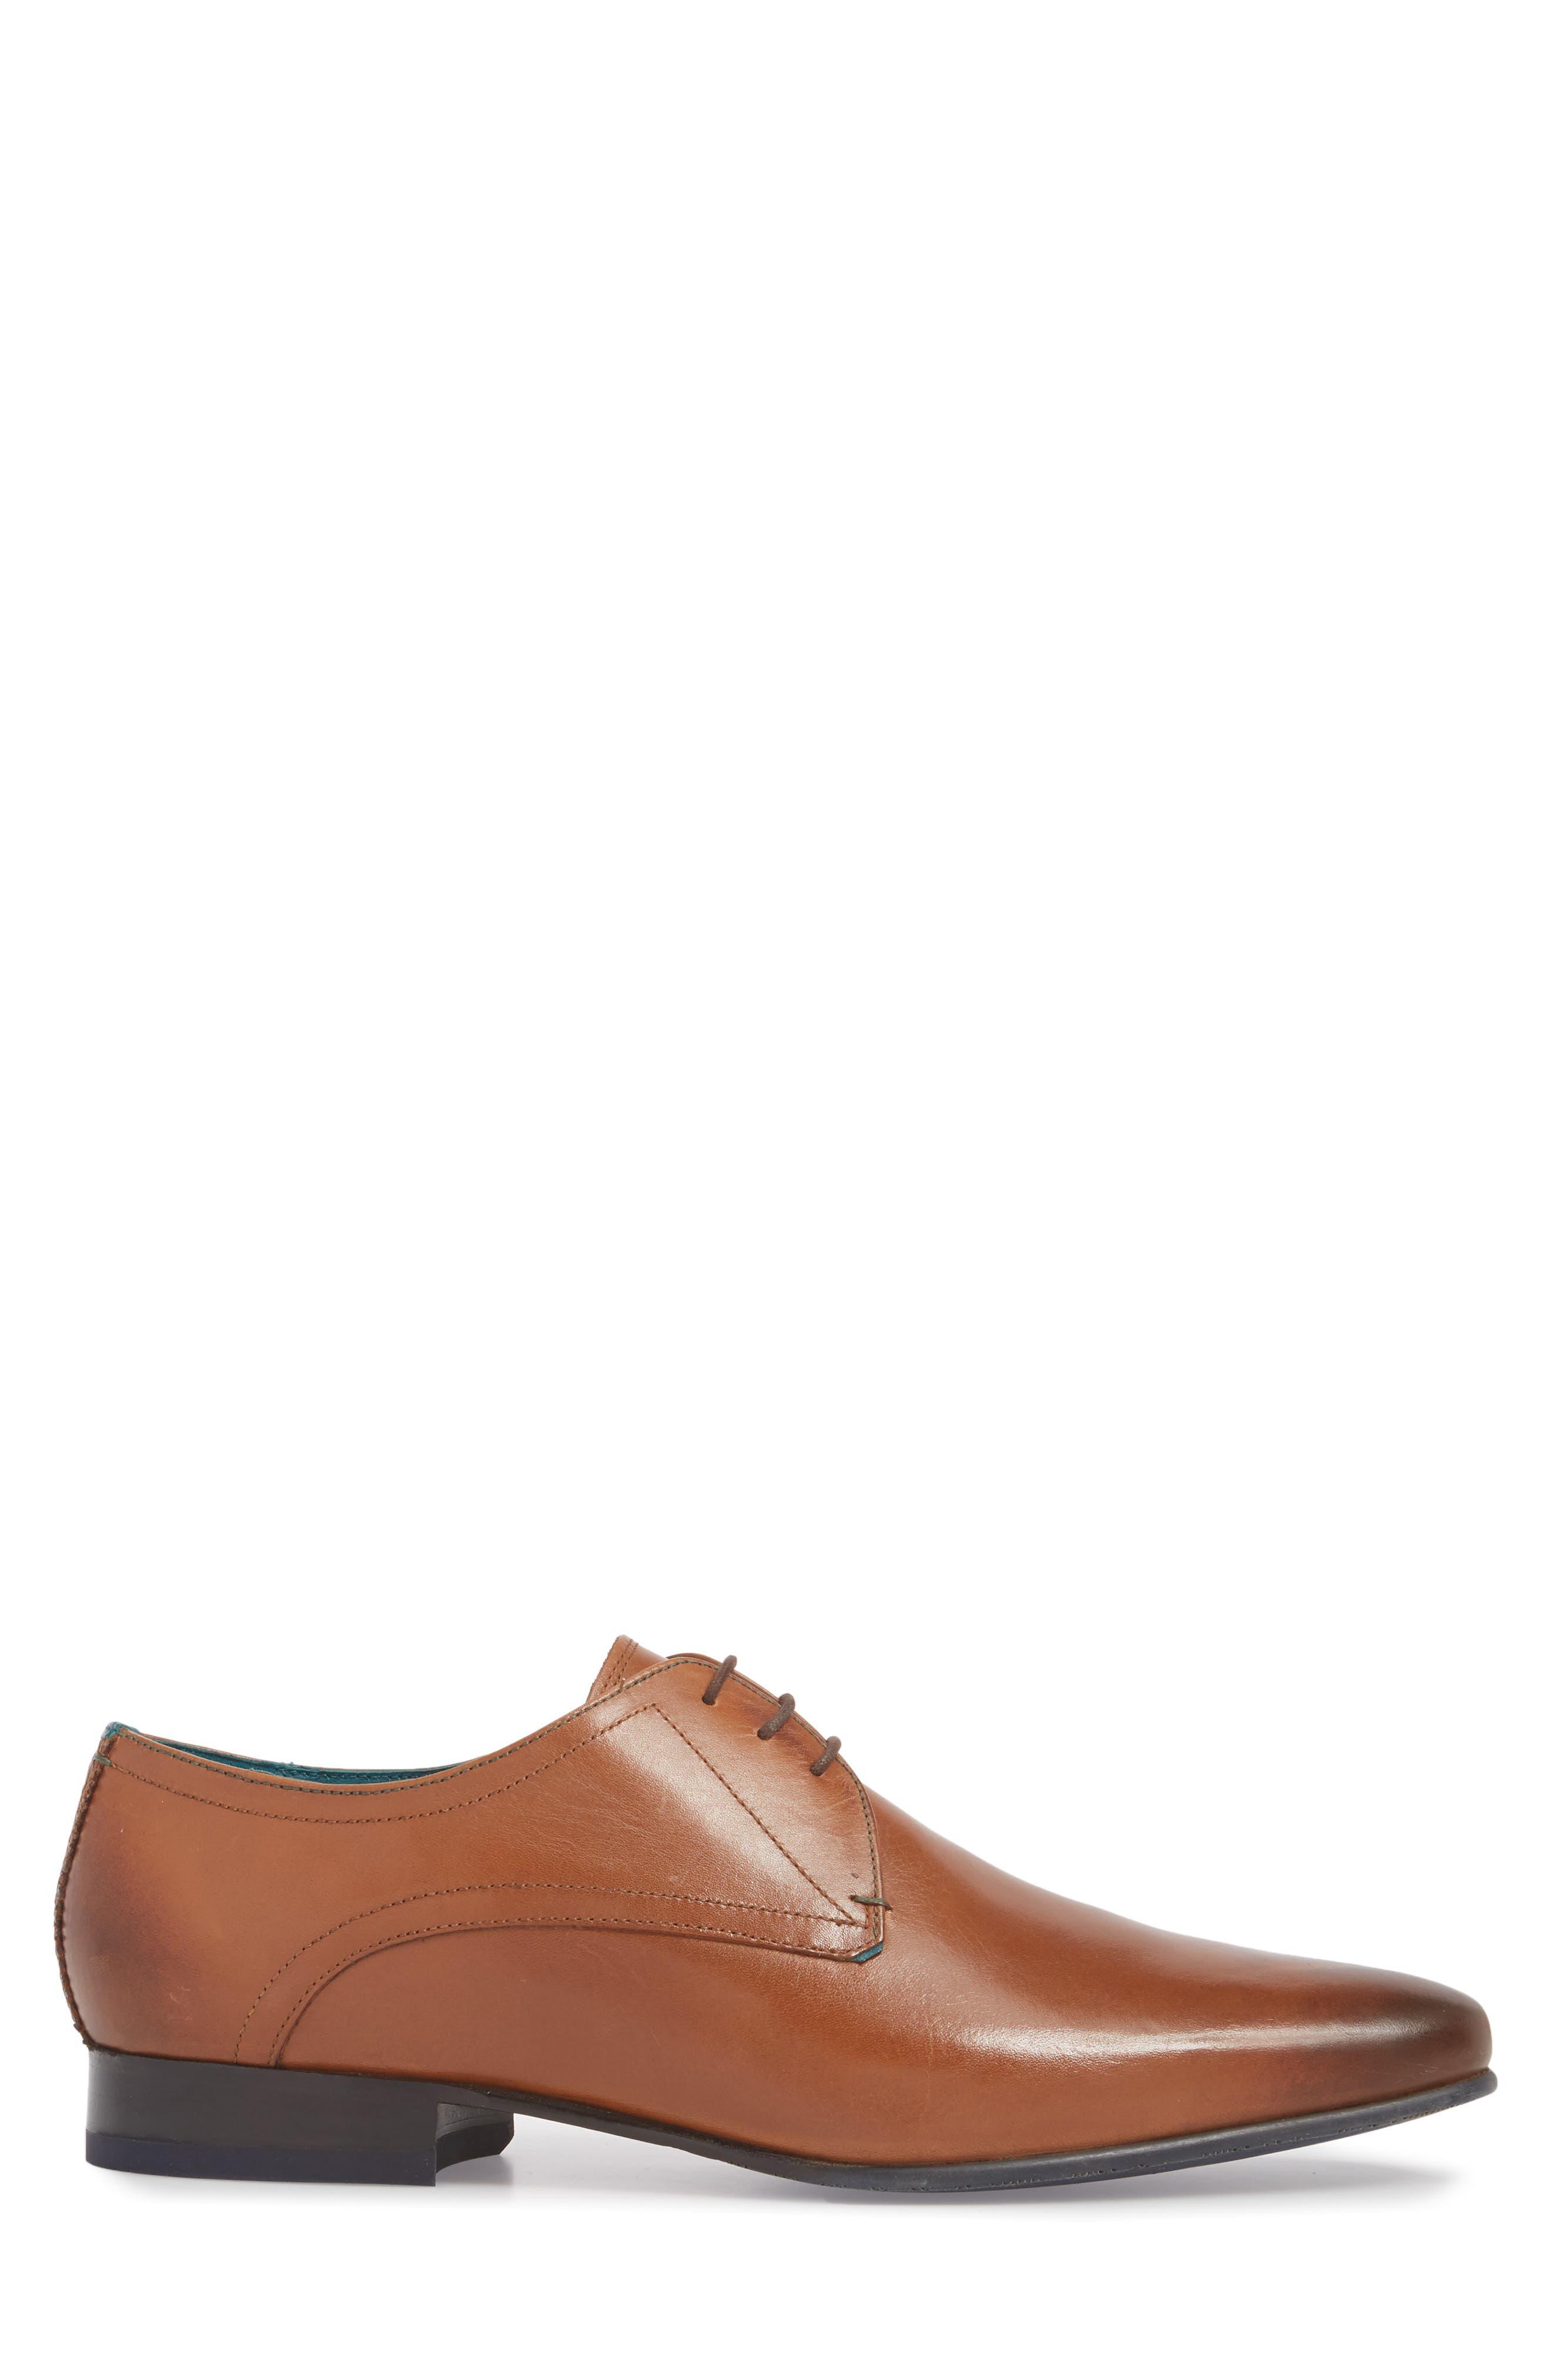 Bhartli Plain Toe Derby,                             Alternate thumbnail 3, color,                             Tan Leather